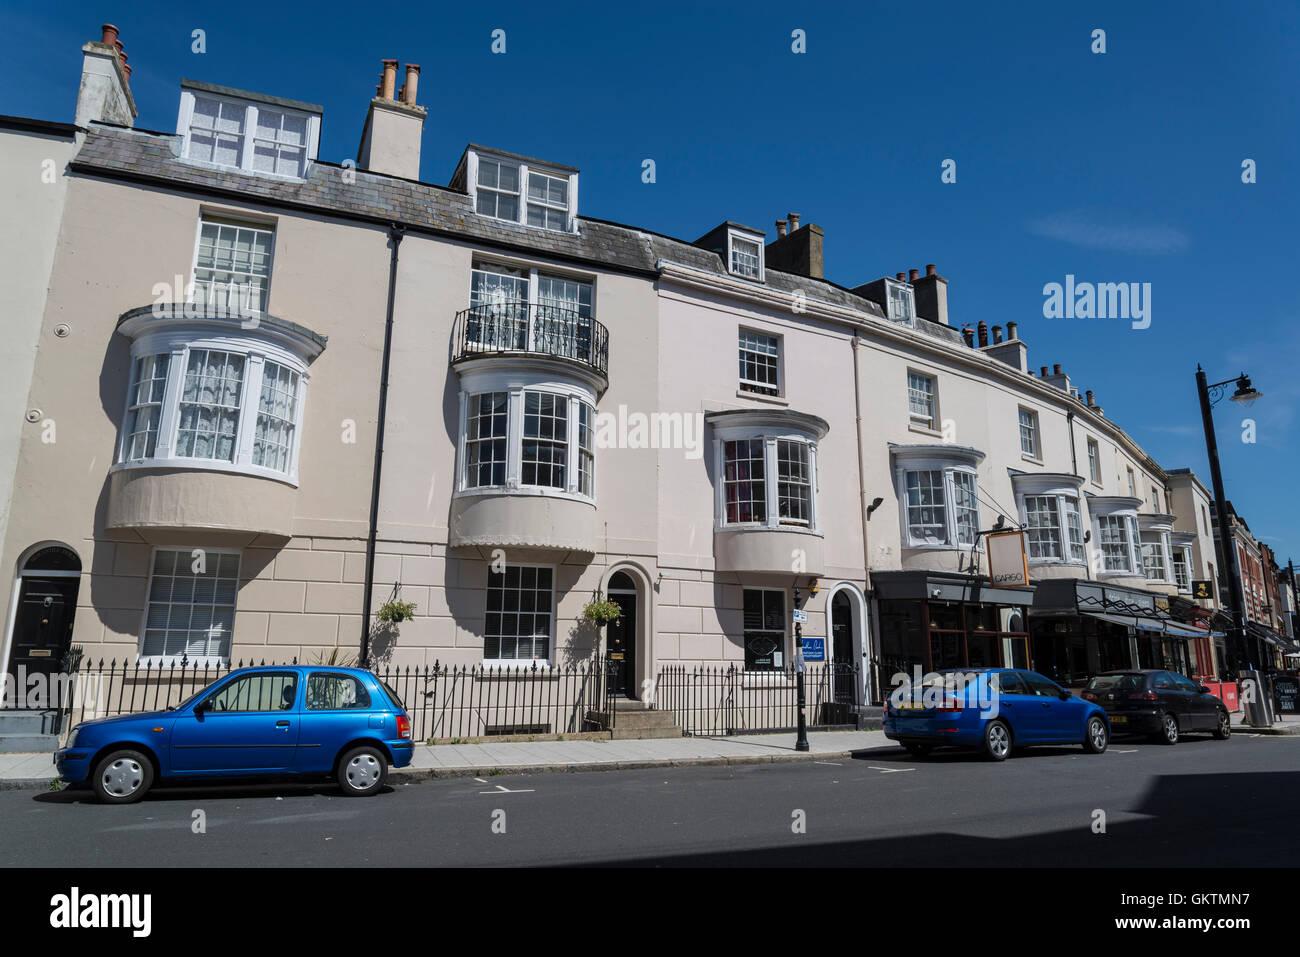 Oxford Street, Southampton, Hampshire, England, UK - Stock Image